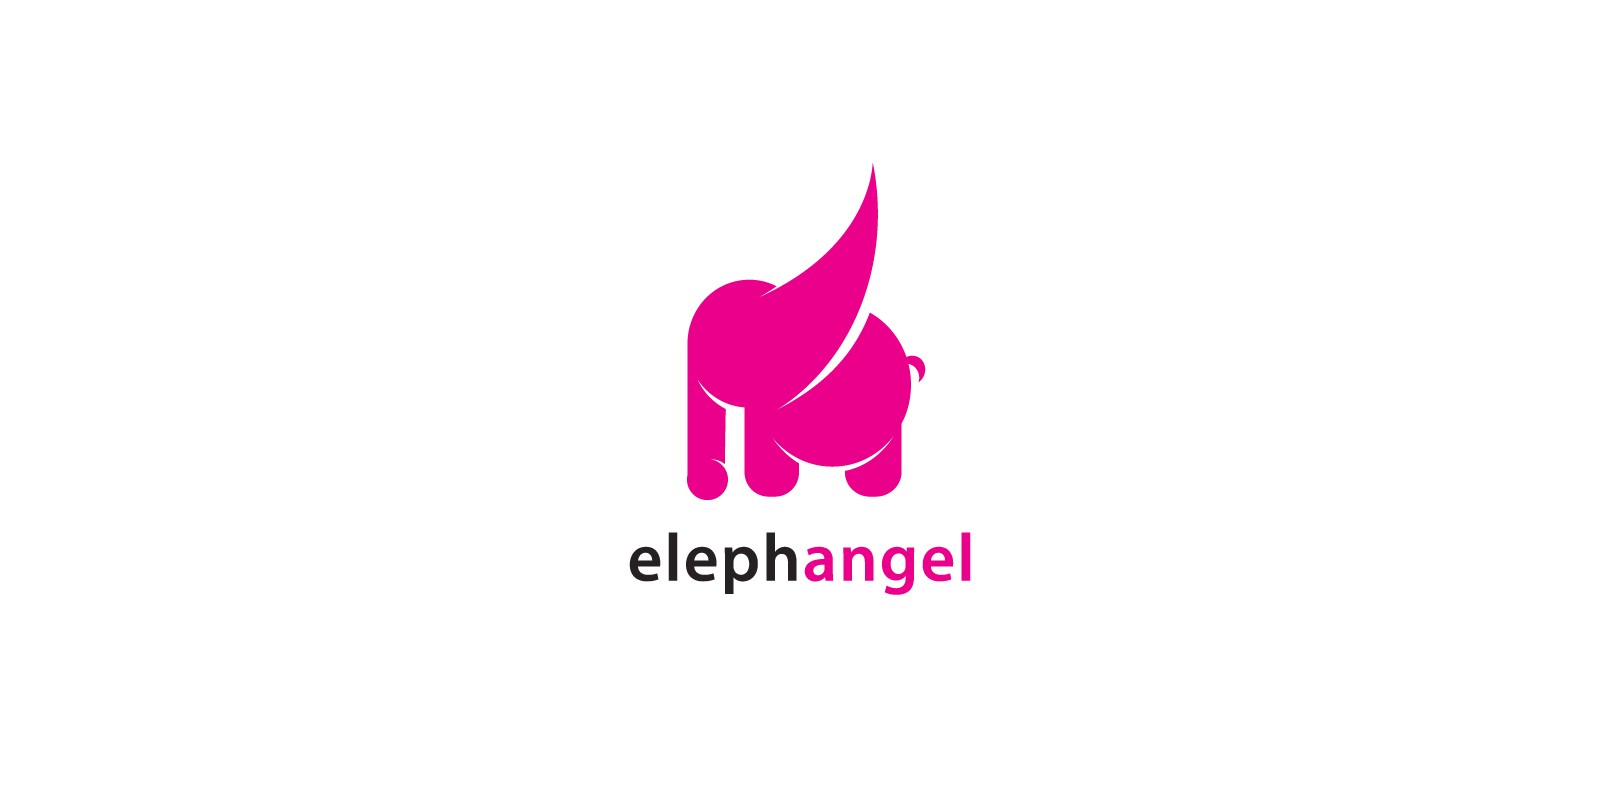 Elephant angel Logo